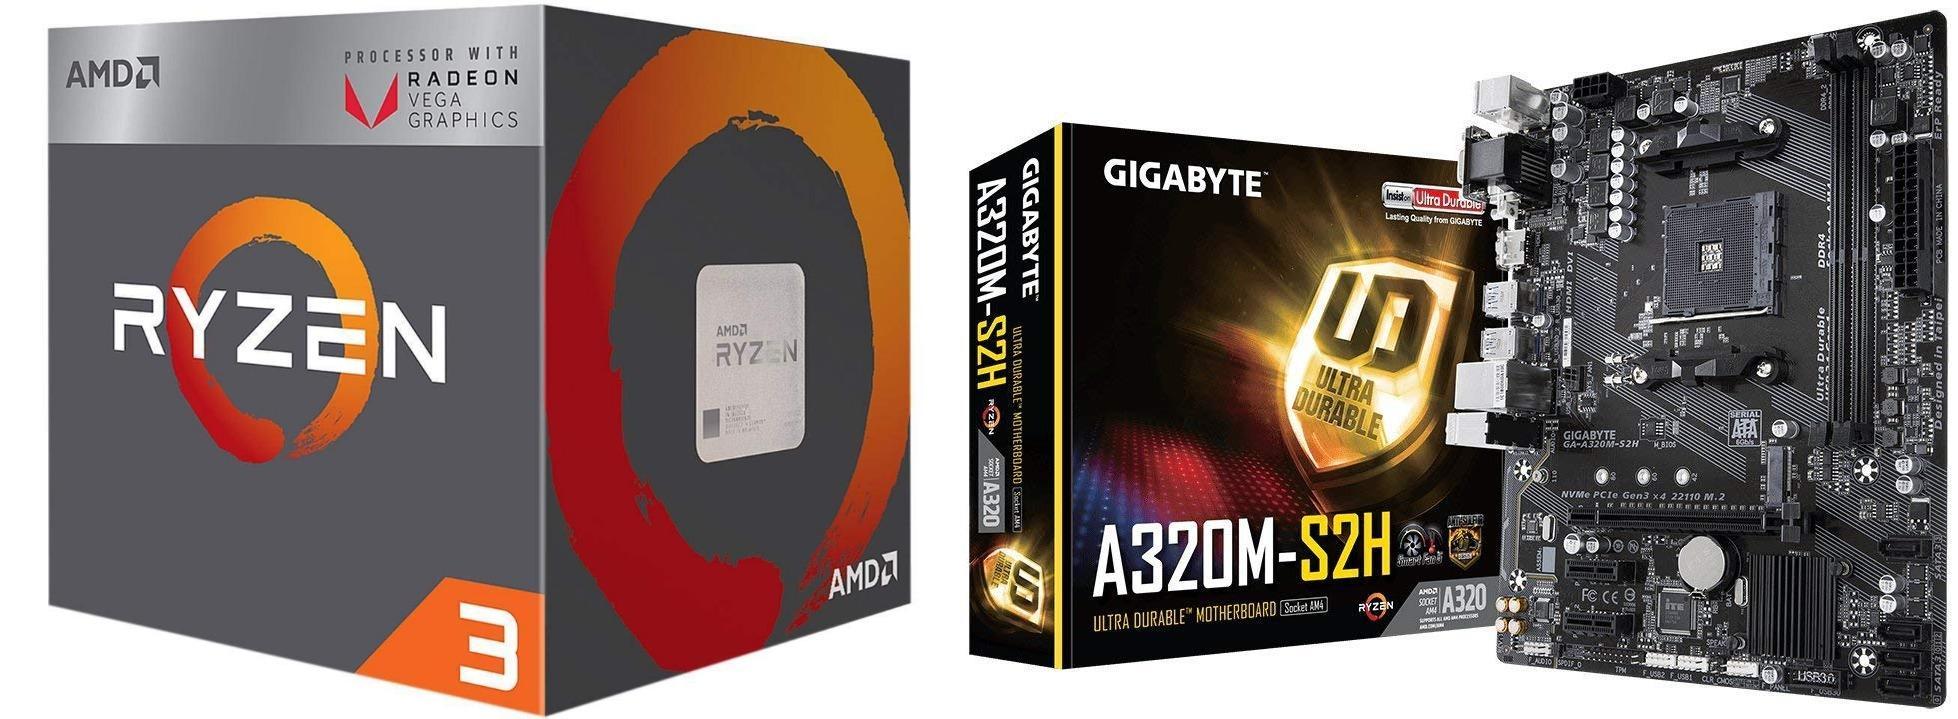 Amd Philippines Amd Price List Processor Desktop For Sale Lazada